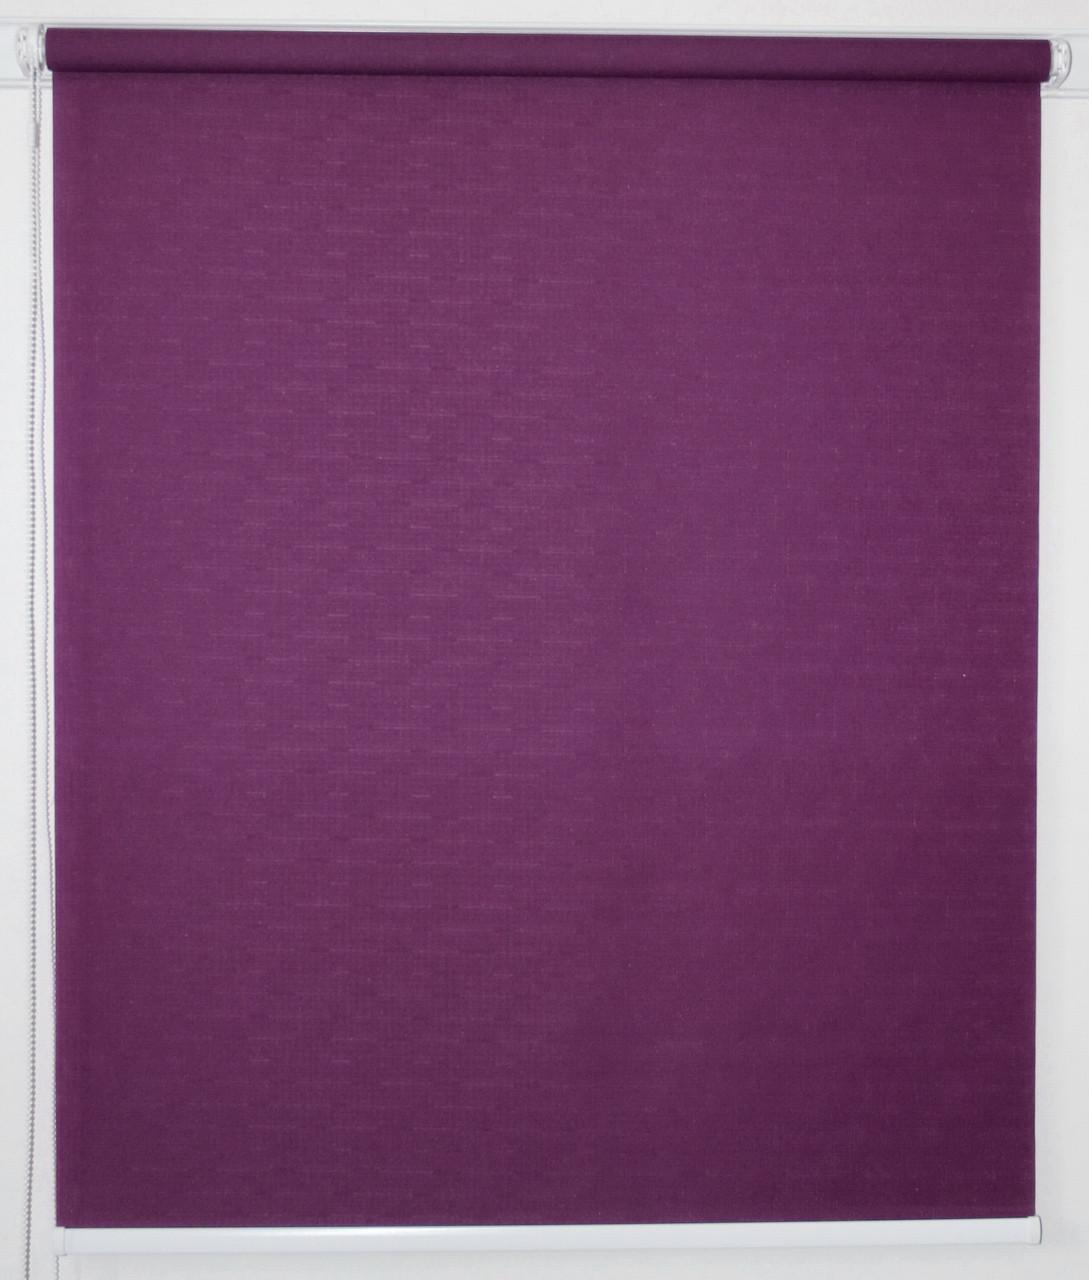 Рулонная штора 1100*1500 Лён 613 Фиолетовый